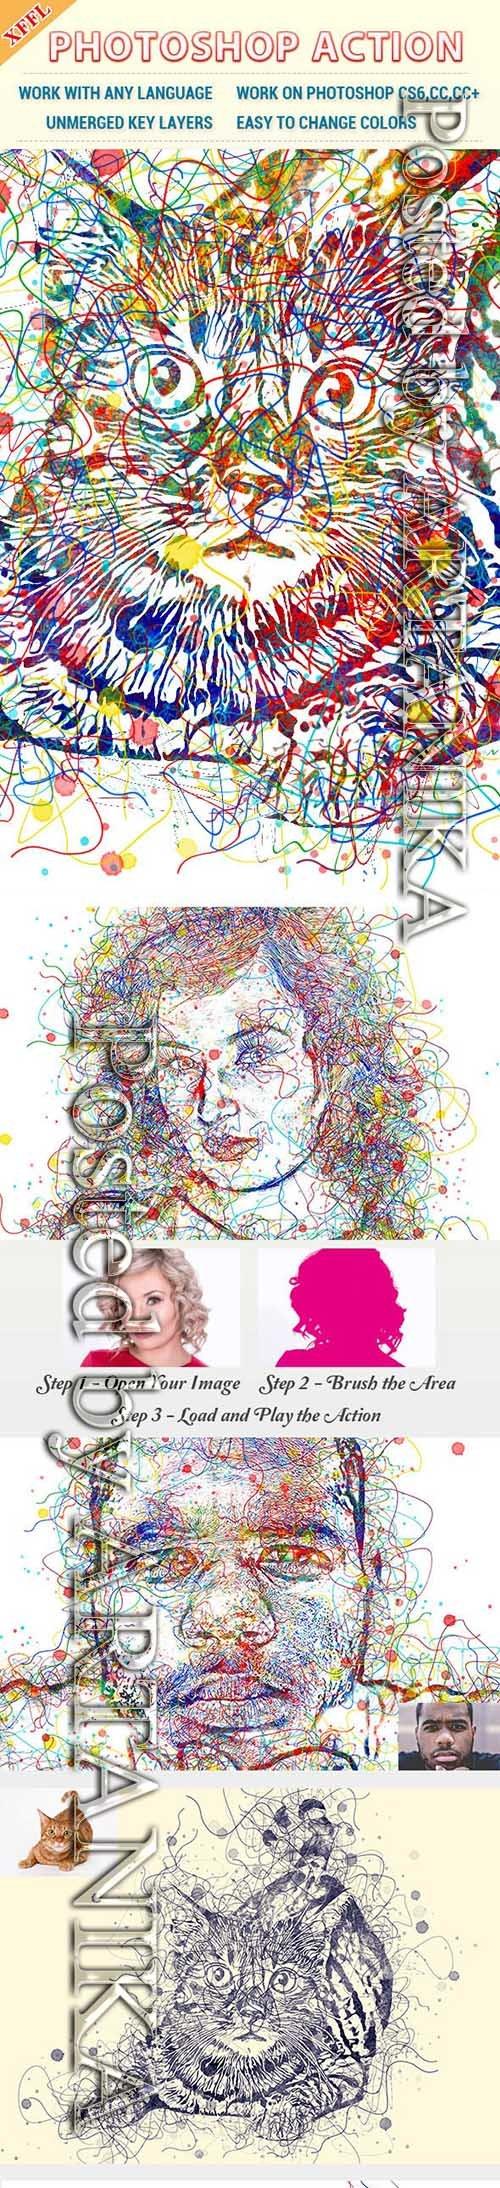 Watercolor Line Photoshop Action 23492662